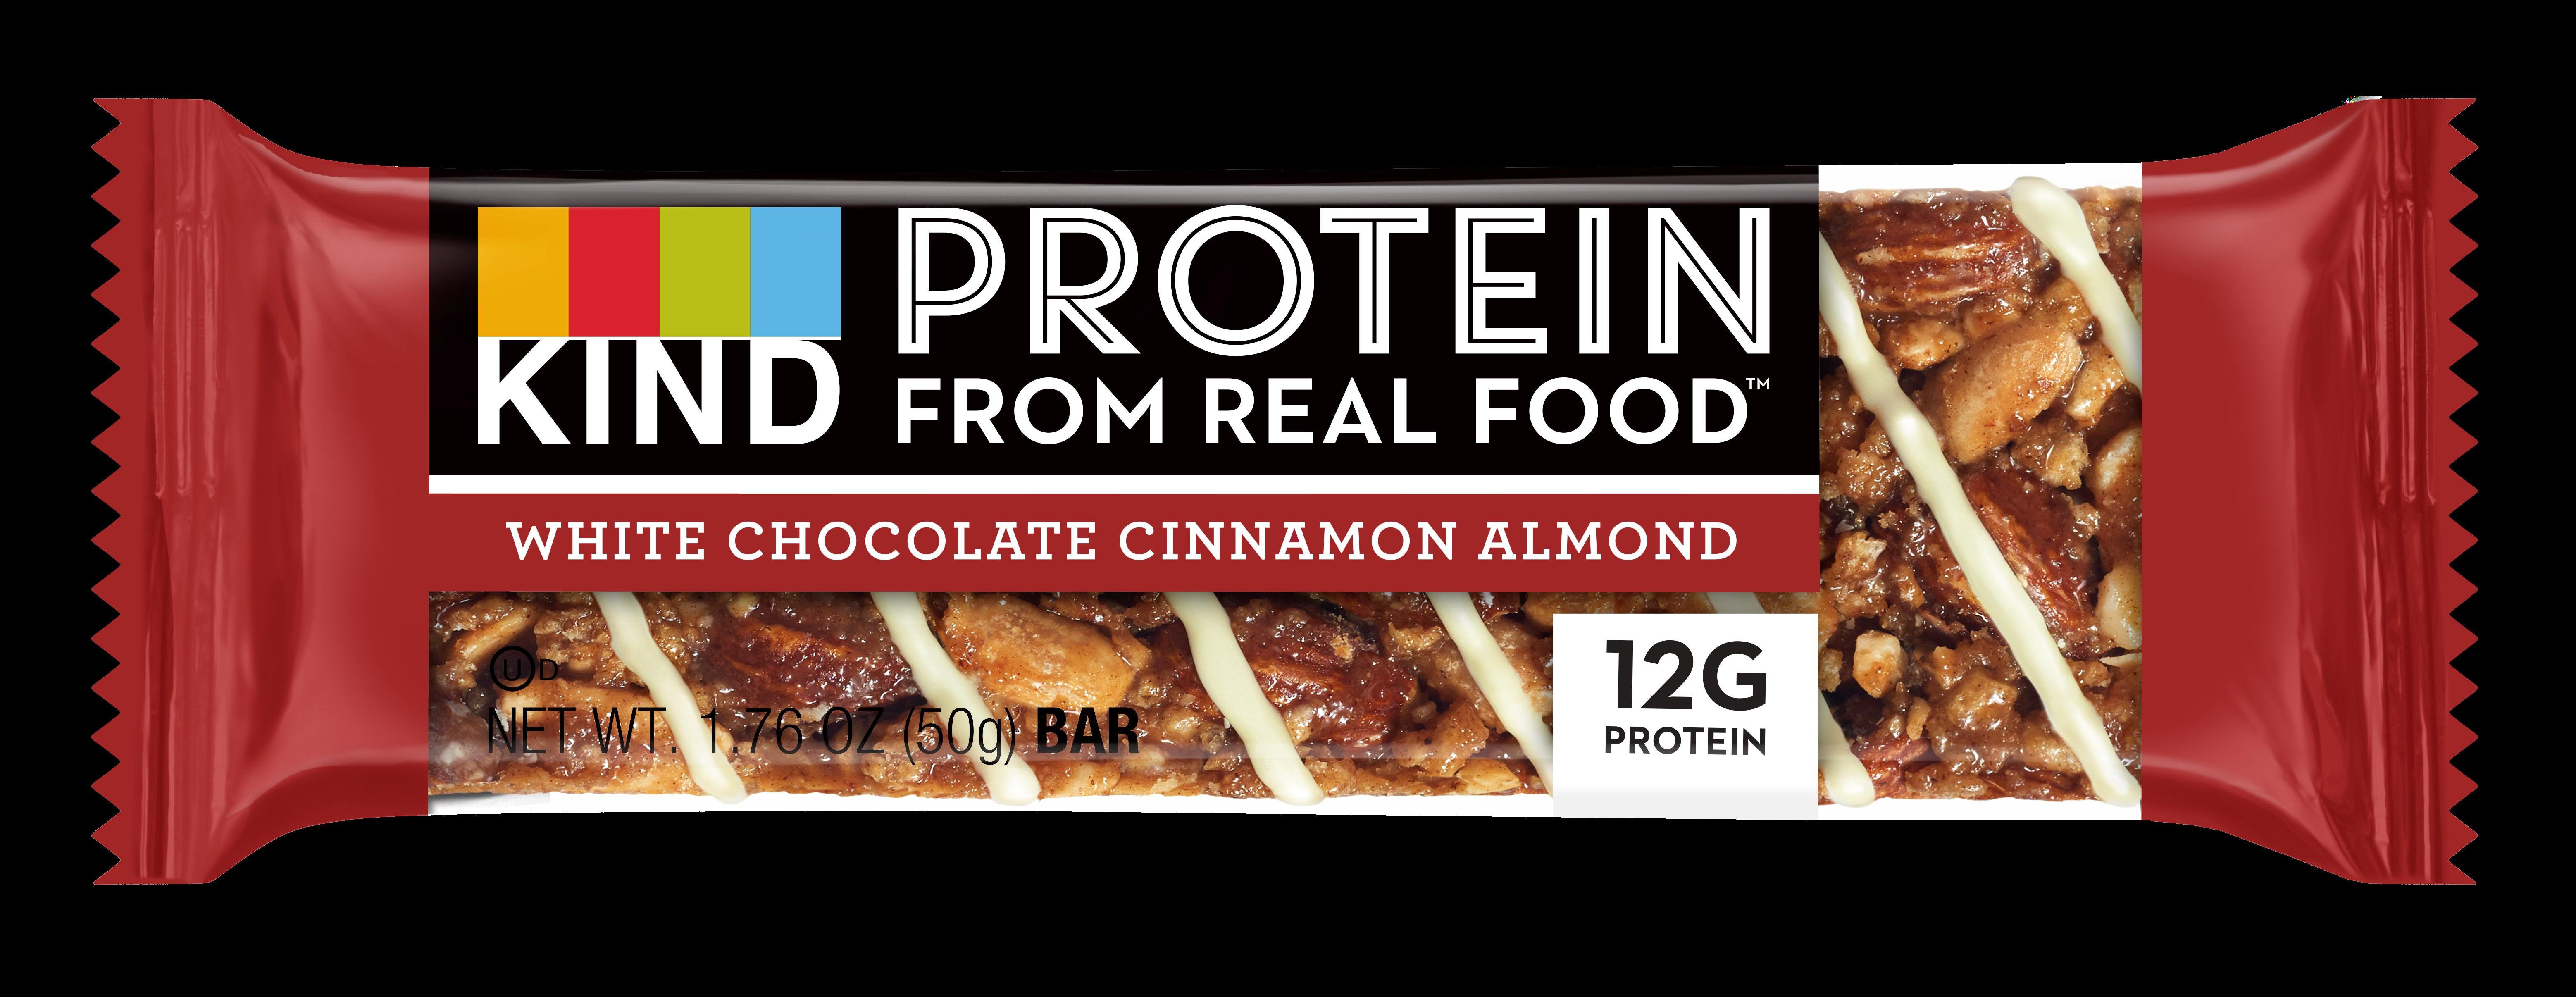 KIND Snacks Protein Bar White Chocolate Cinnamon Almond